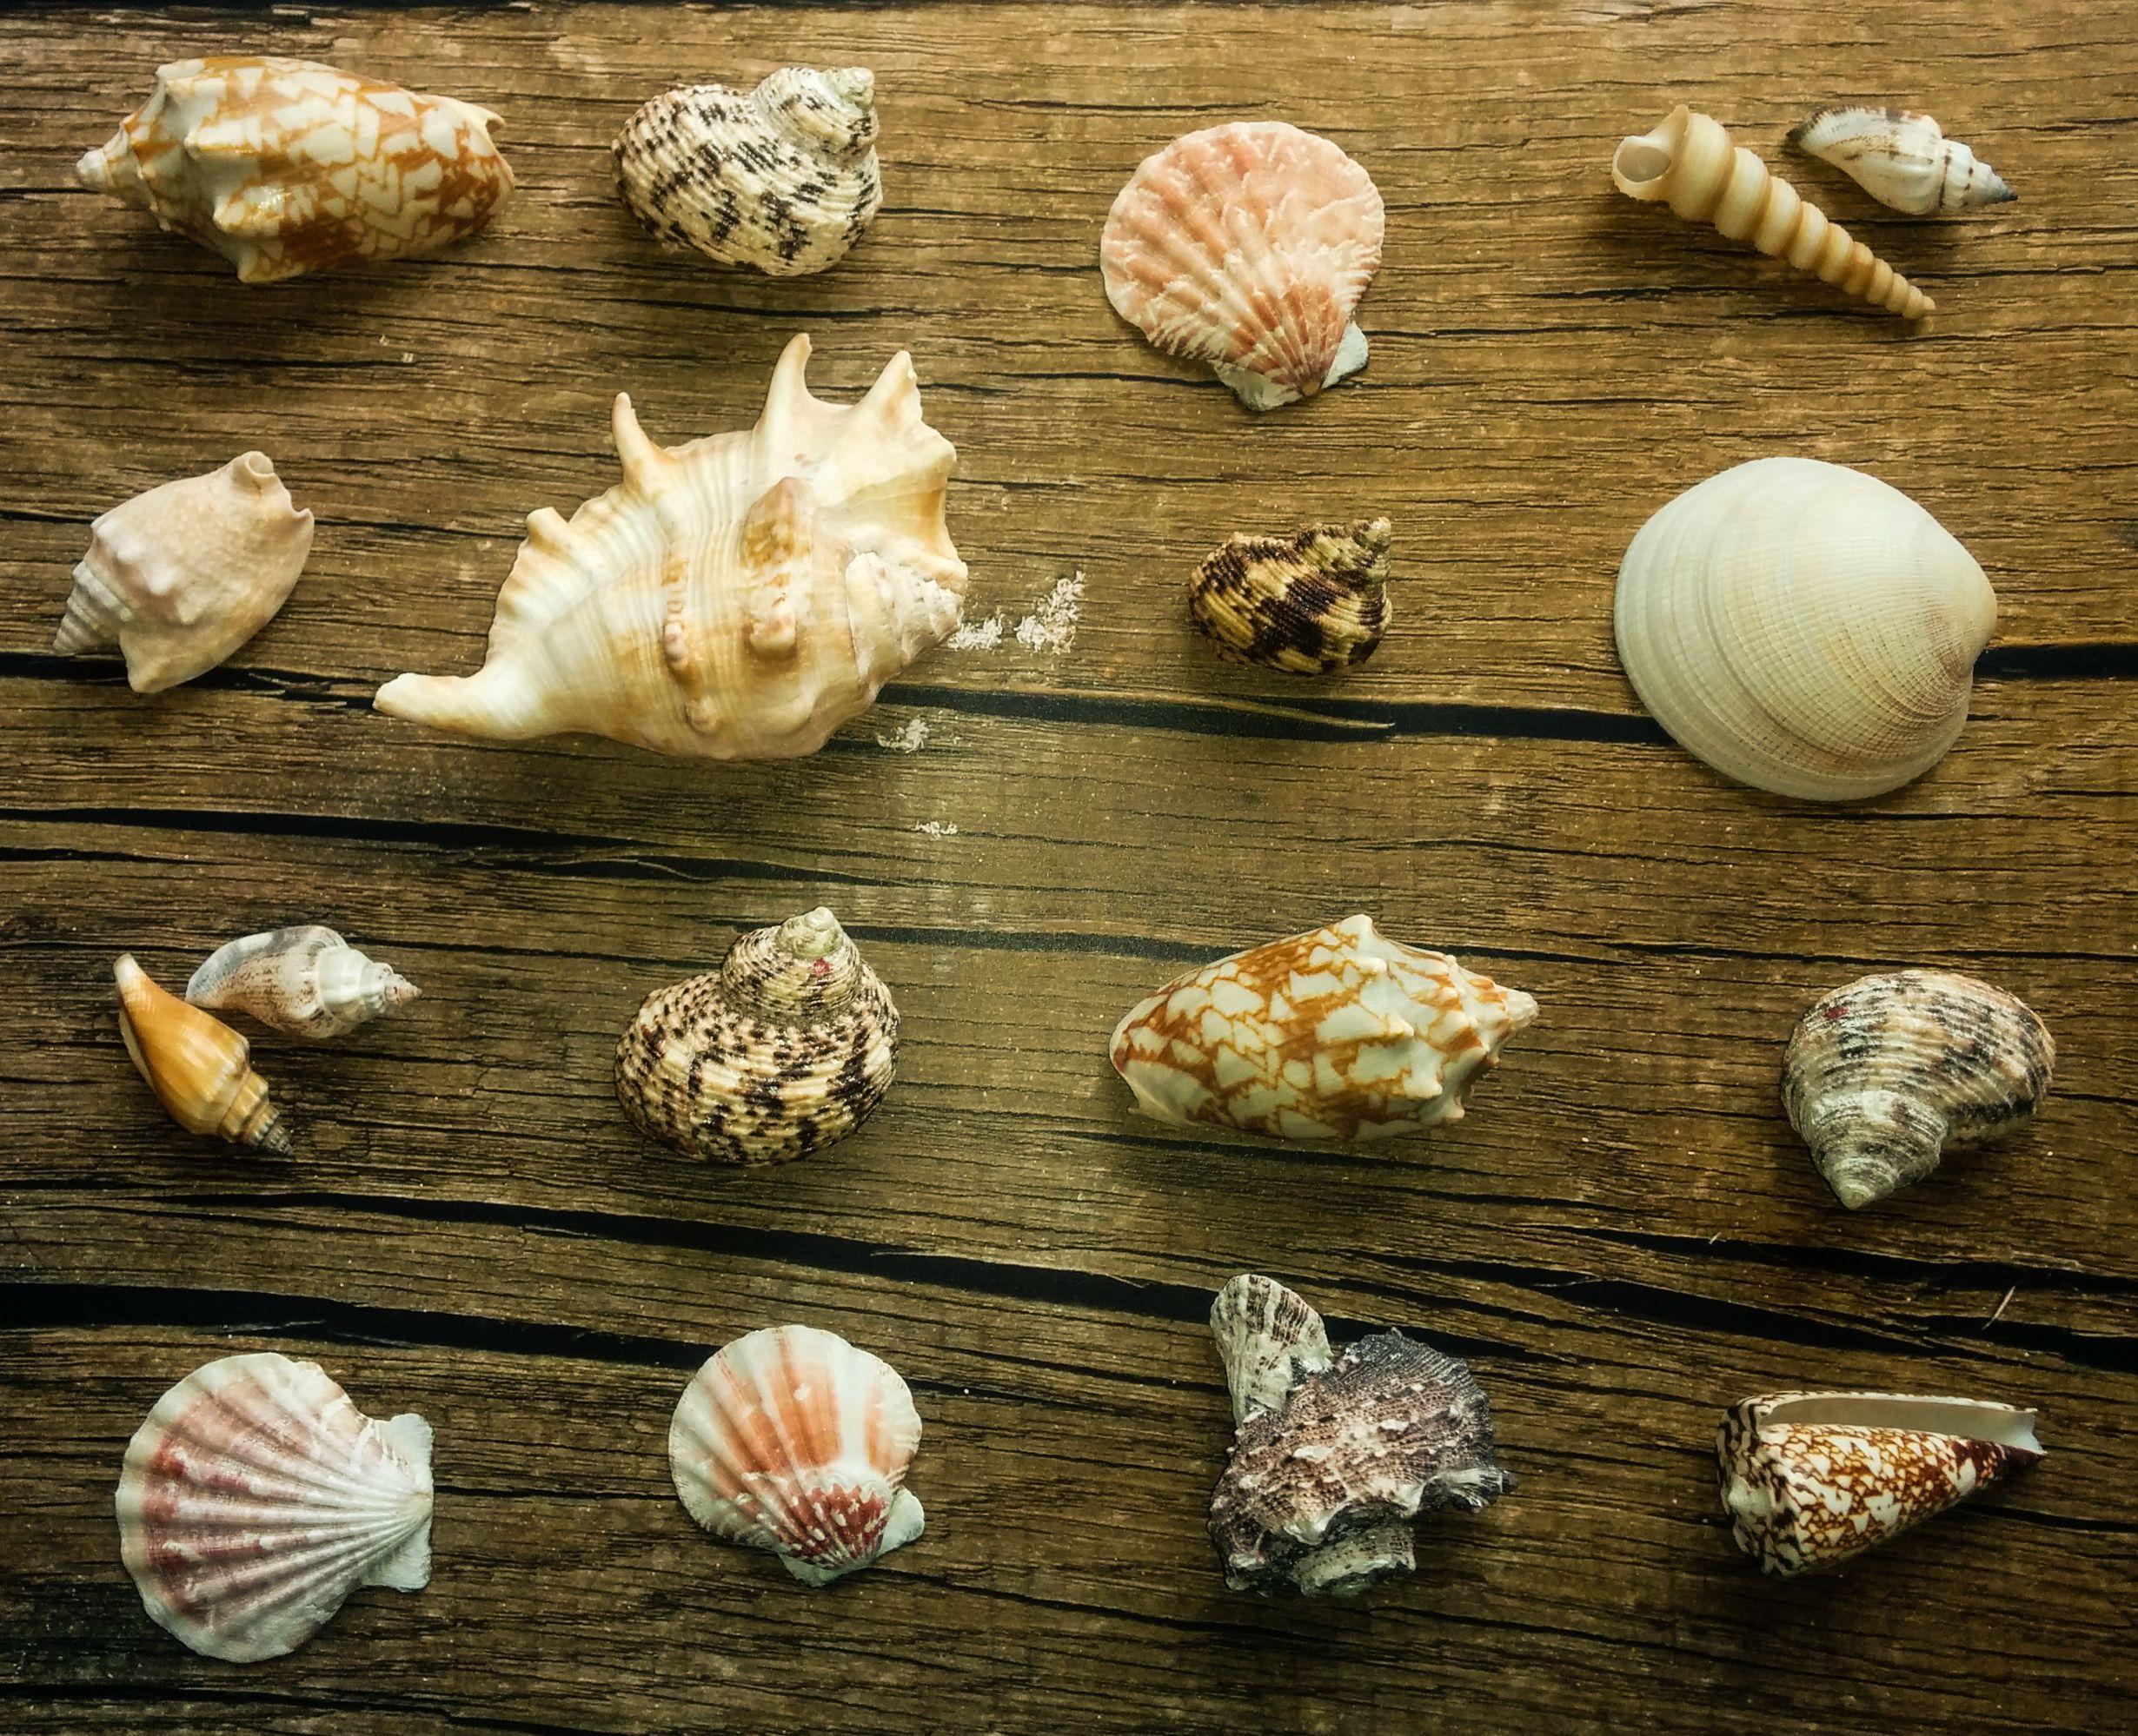 Seashell moodboard by Maria Lillepruun of Magic Attic Design